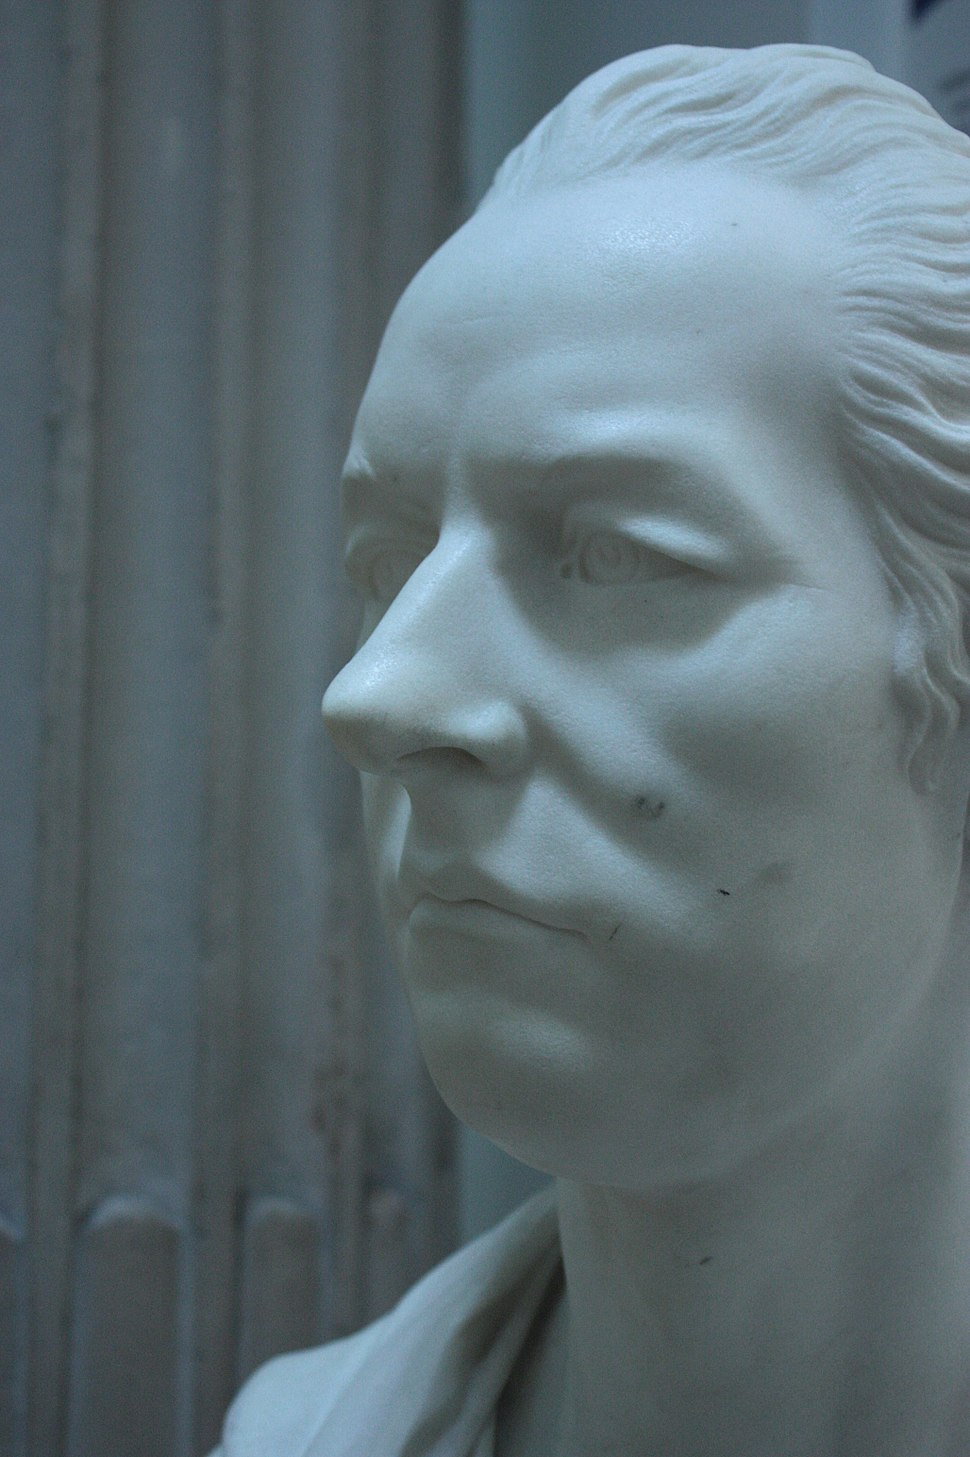 William Pitt by Joseph Nollekens, 1808